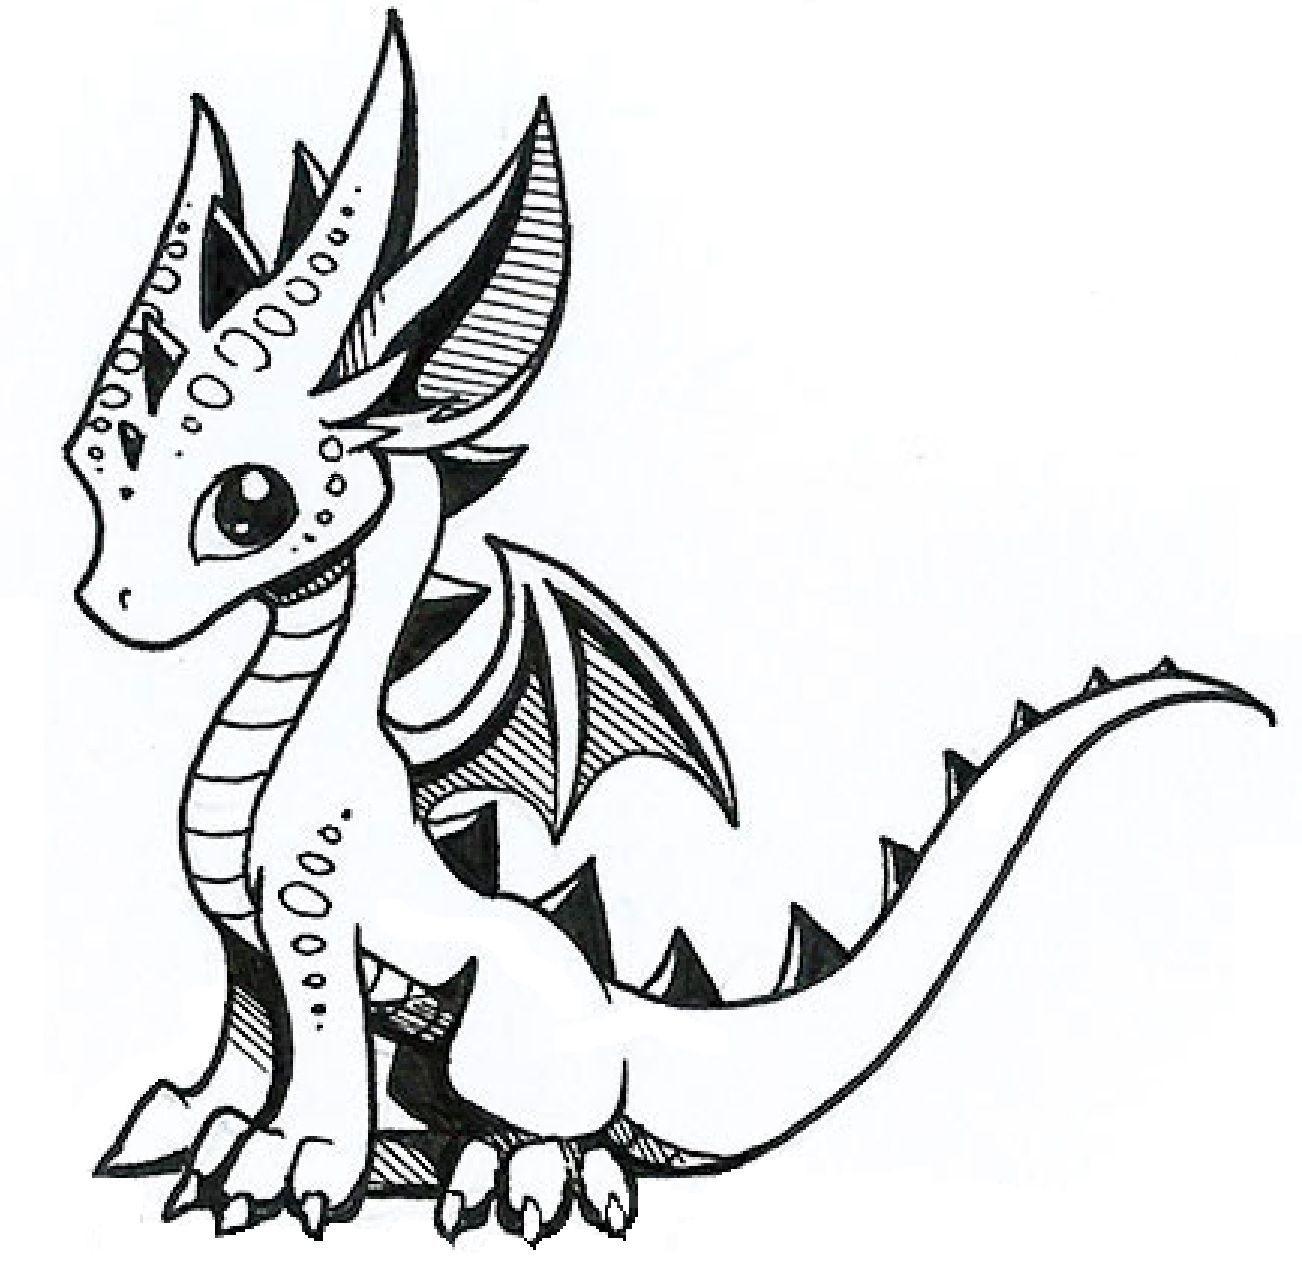 Cute Baby Dragon Drawings In 2020 Dragon Artwork Cute Dragon Drawing Dragon Coloring Page